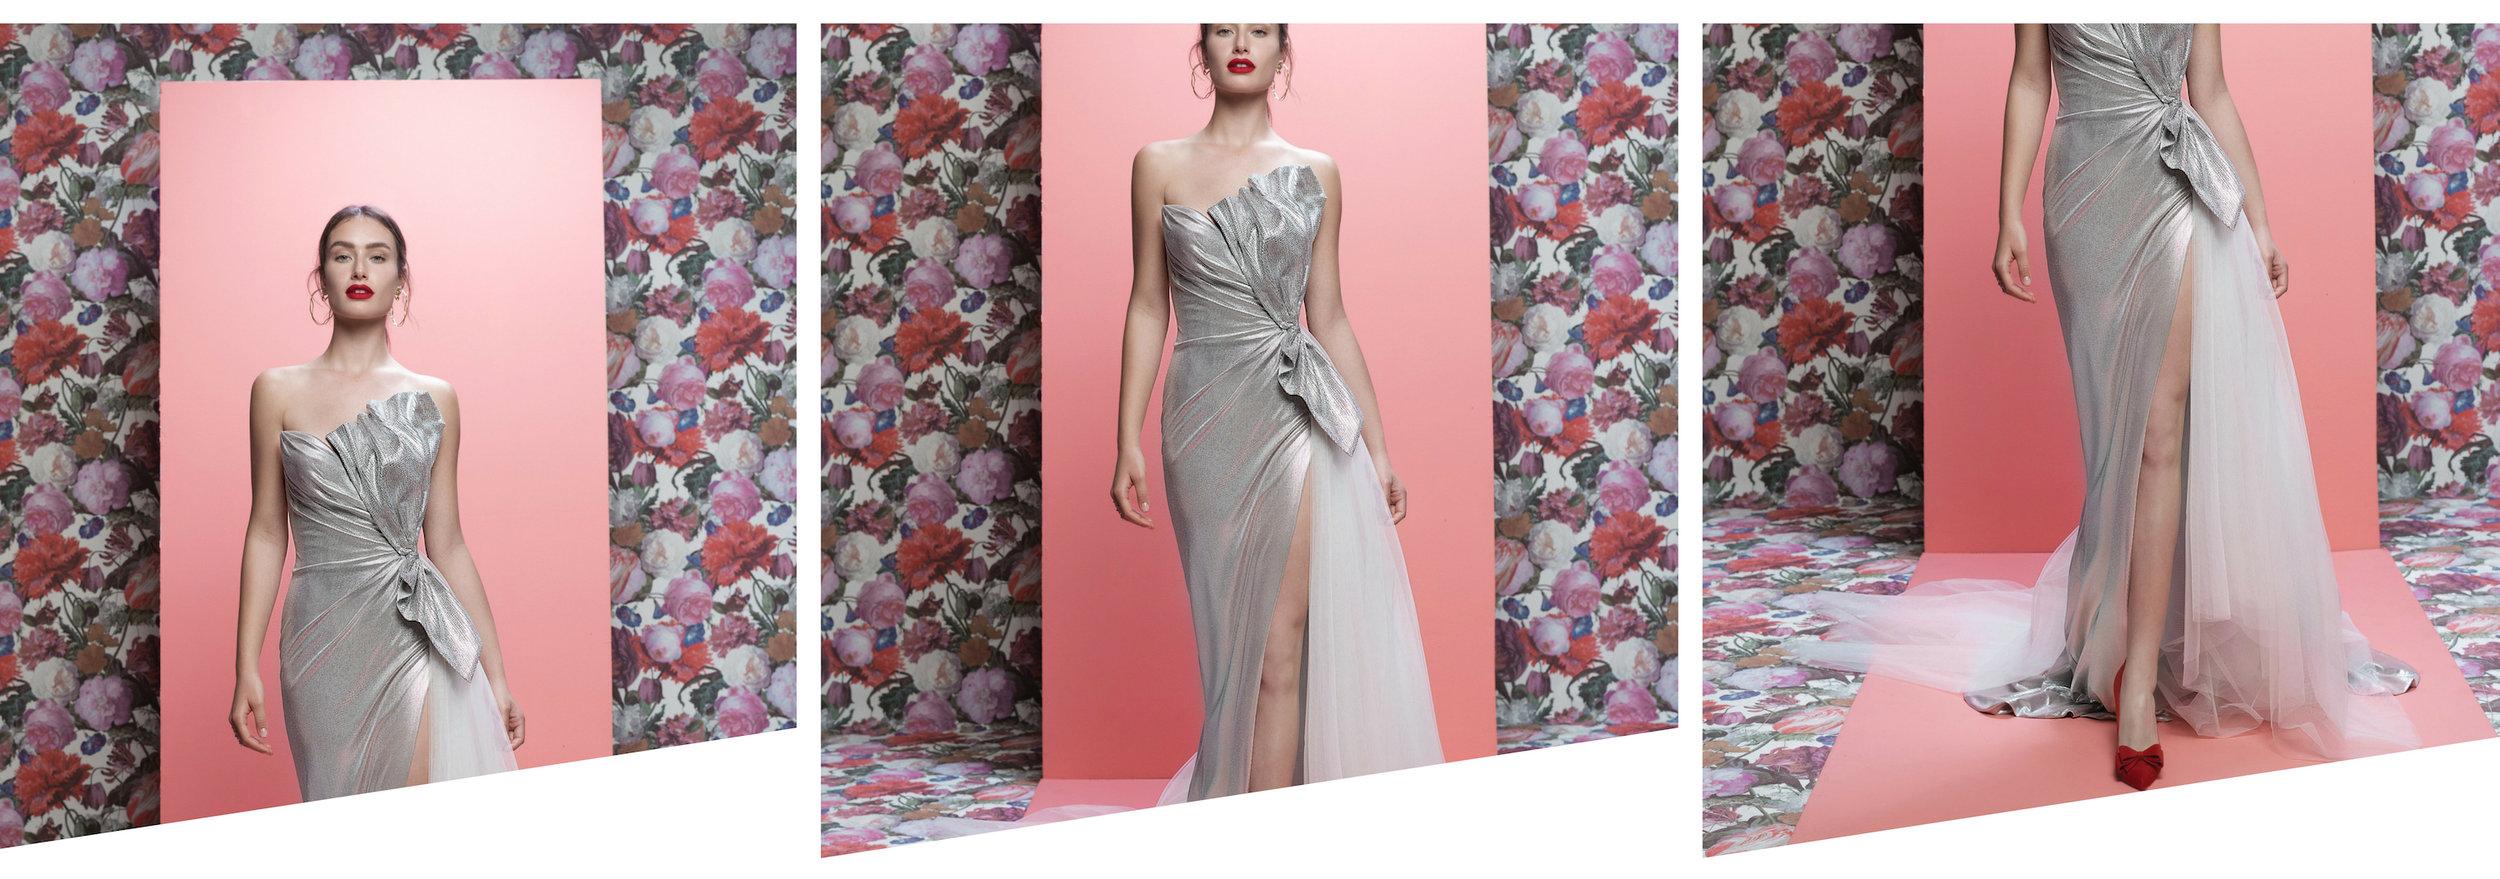 Your wedding dress based on your zodiac